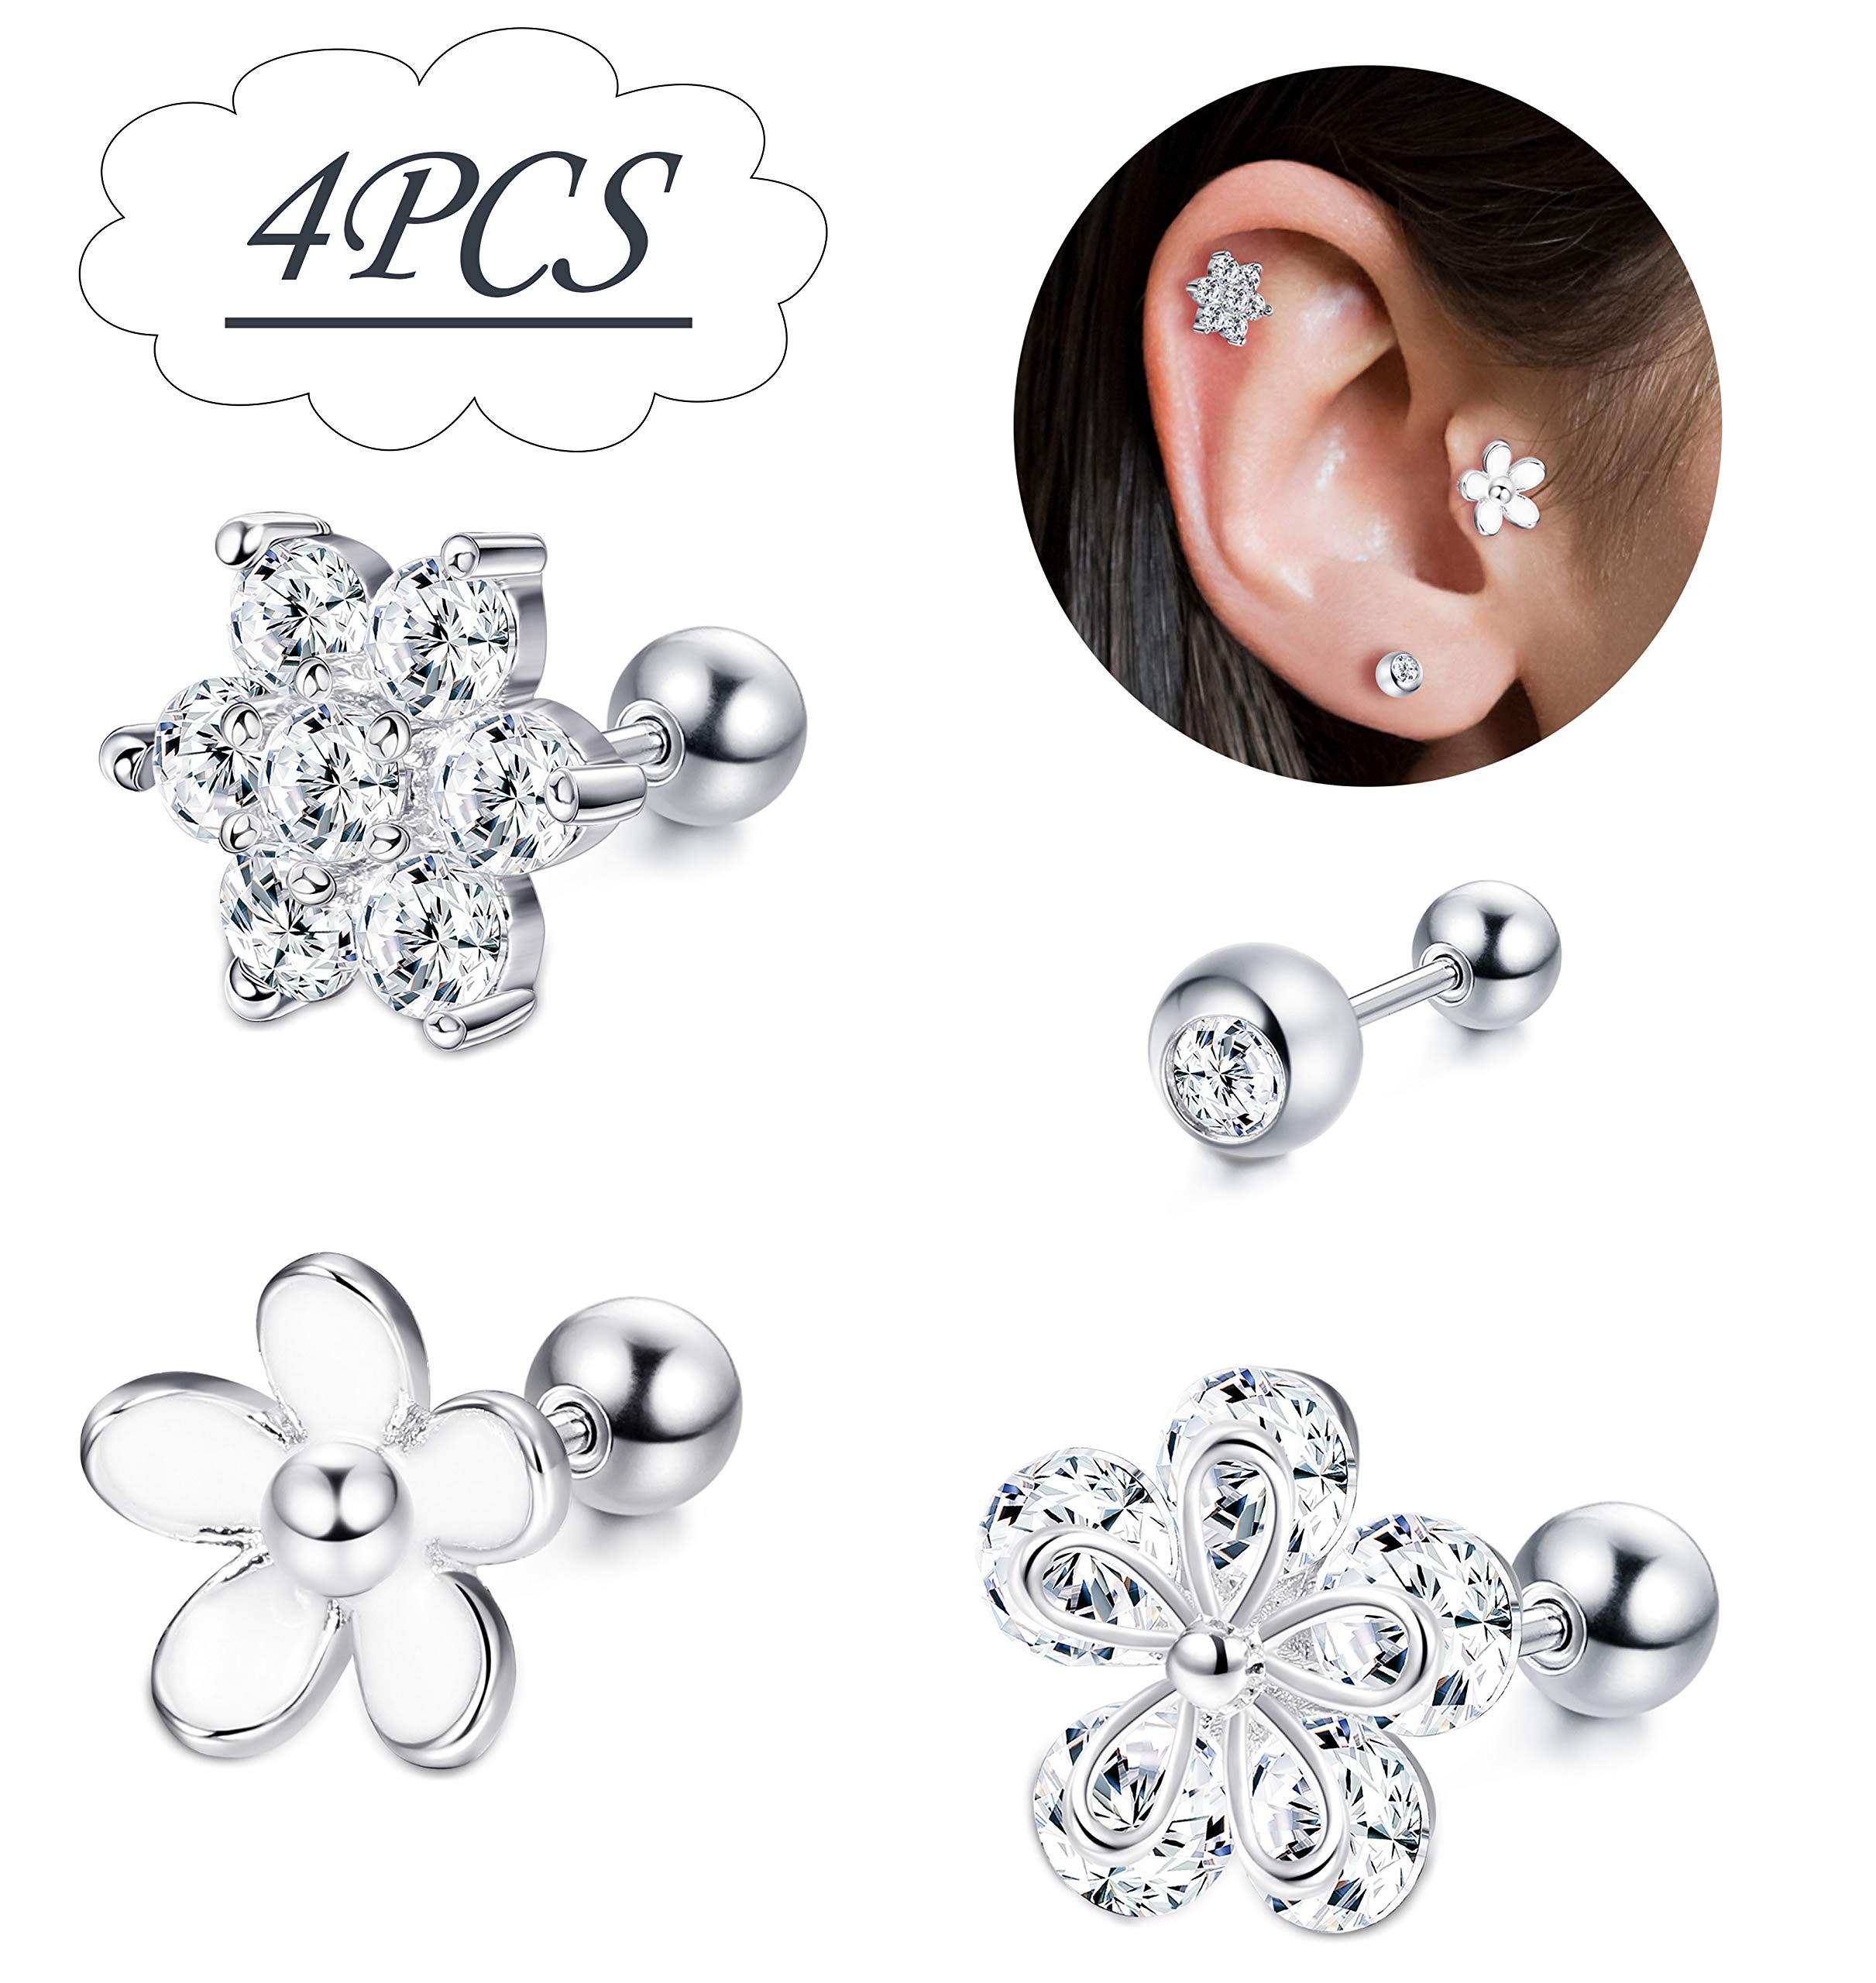 Hanpabum 4Pcs 16G Cartilage Helix Earring Labret Monroe Stud Internally Threaded Flower Barbell Piercing Jewelry